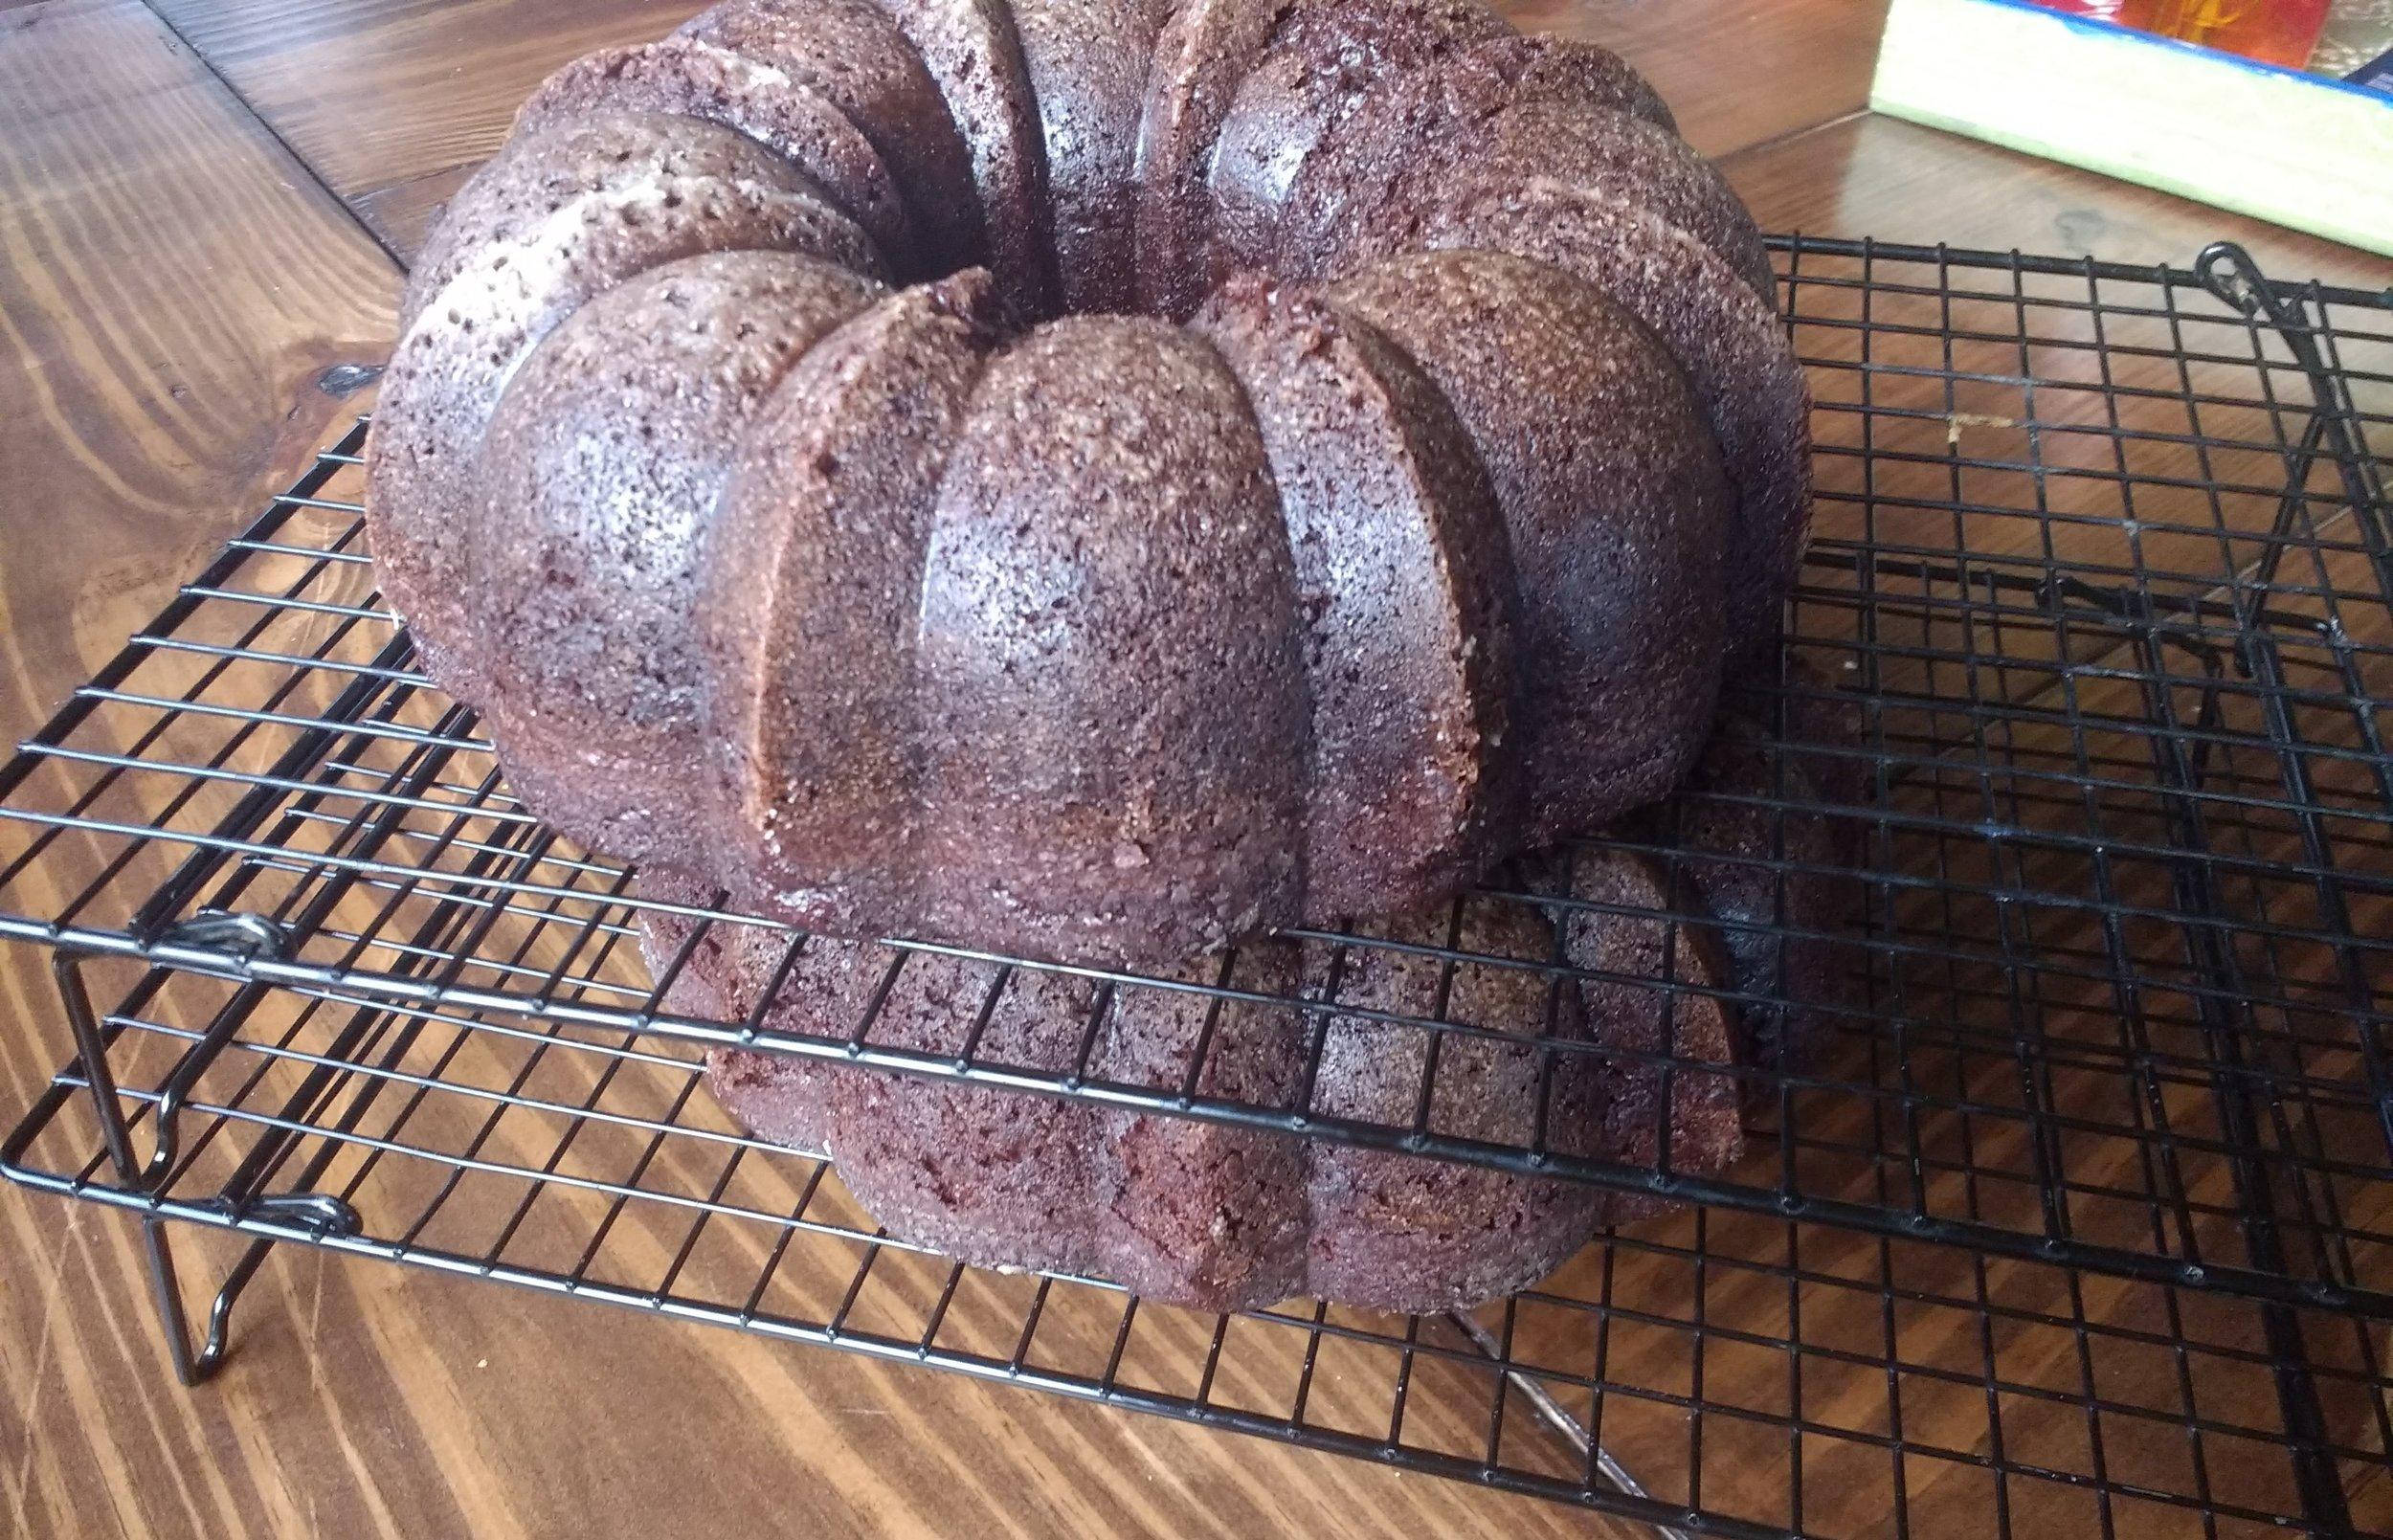 Beneath the Cake: how to make a Pumpkin-Shaped Cake